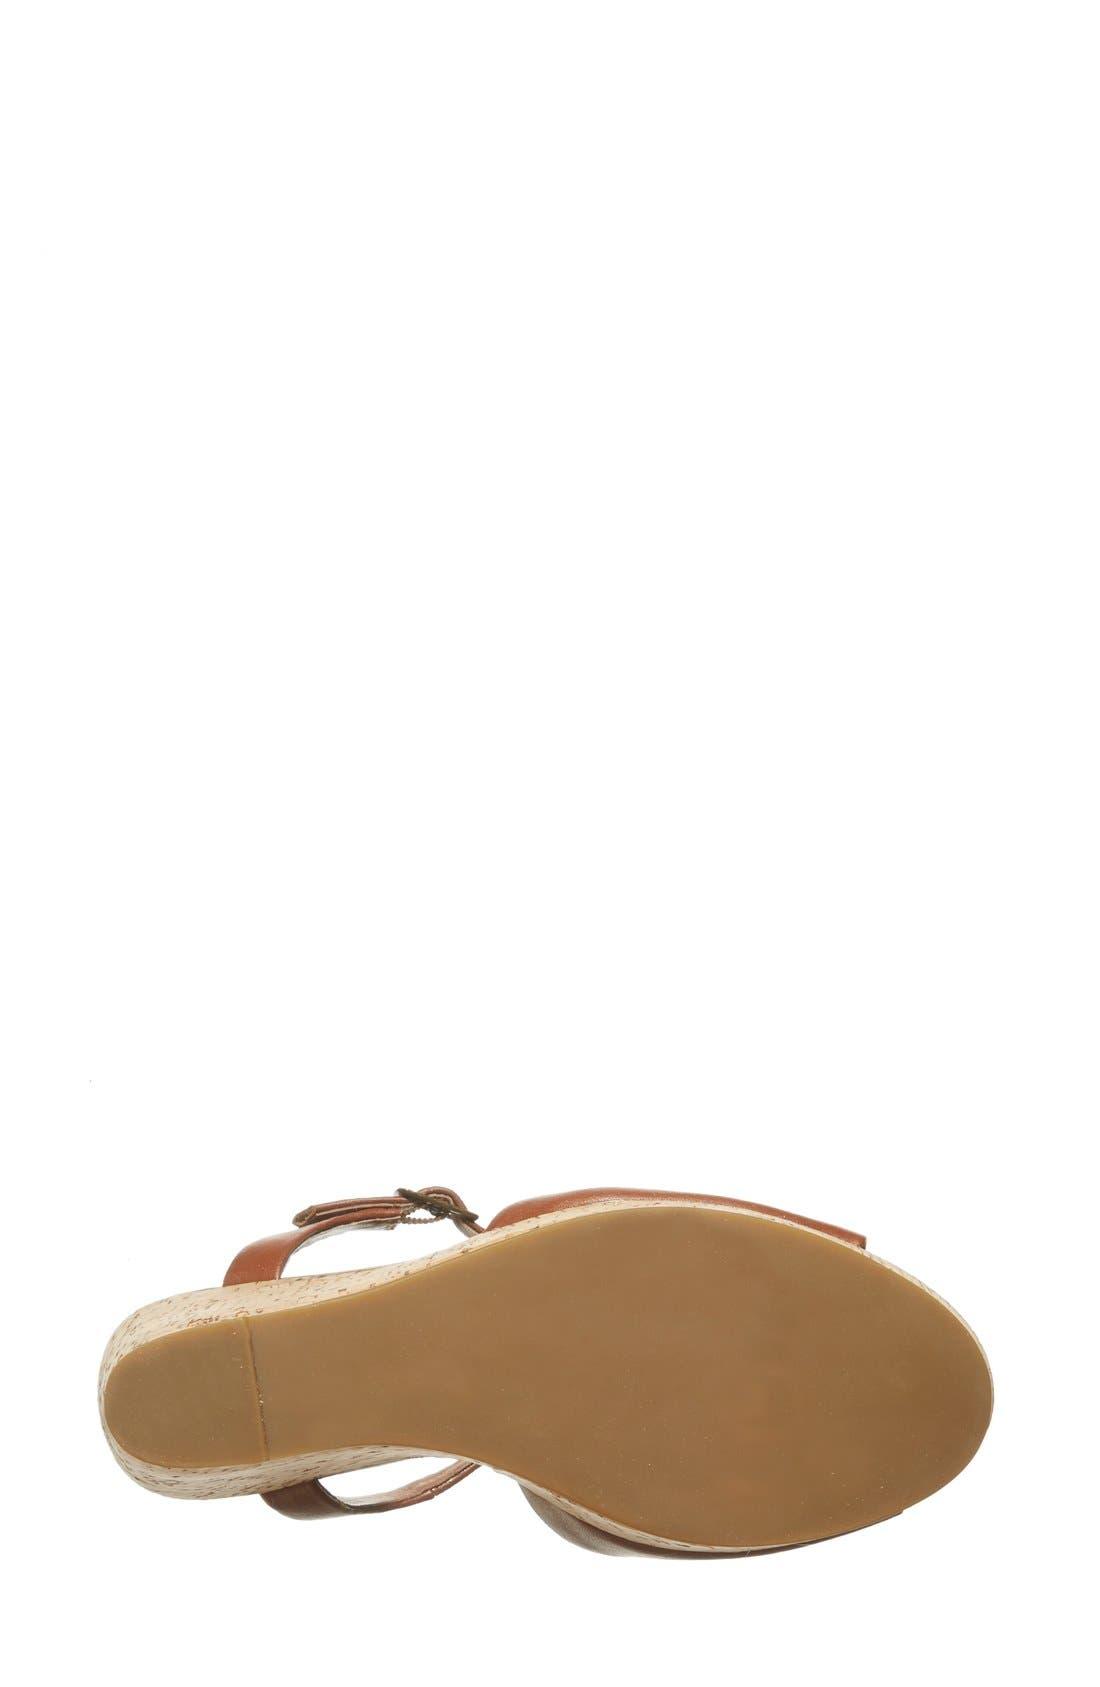 'Korkey' Ankle Strap Wedge Platform Sandal,                             Alternate thumbnail 4, color,                             Cognac